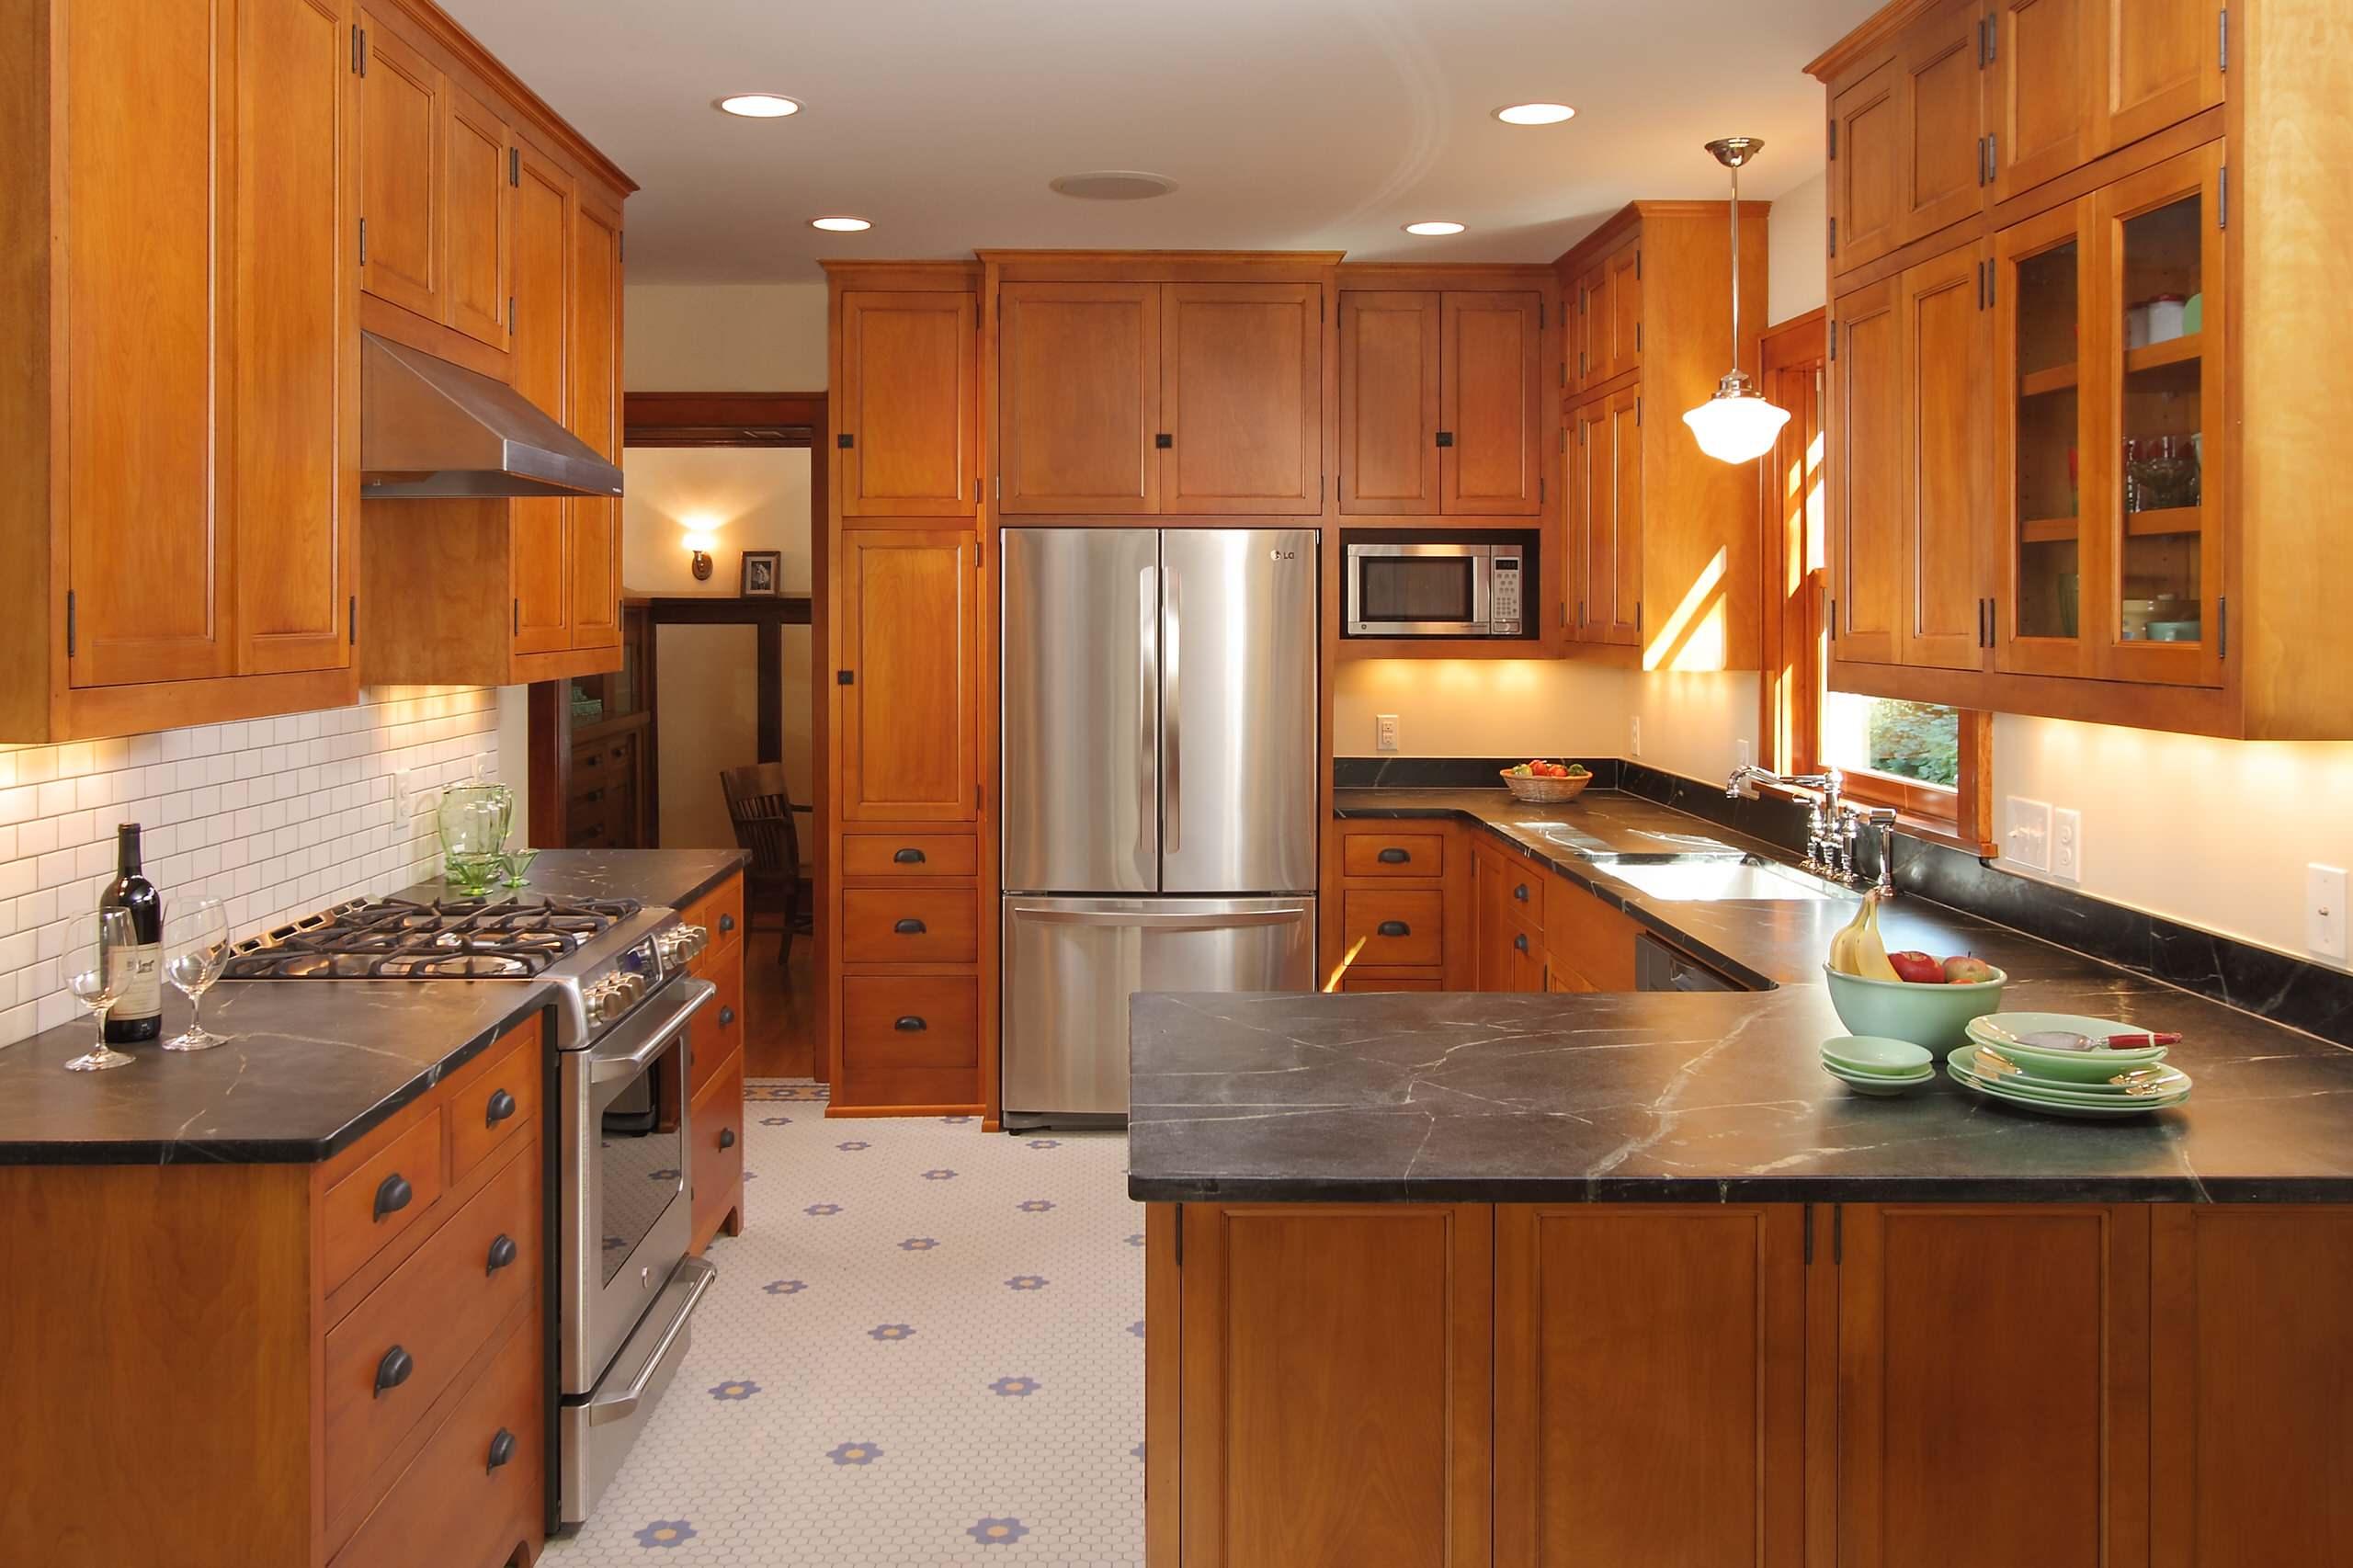 Bungalow Kitchen Houzz